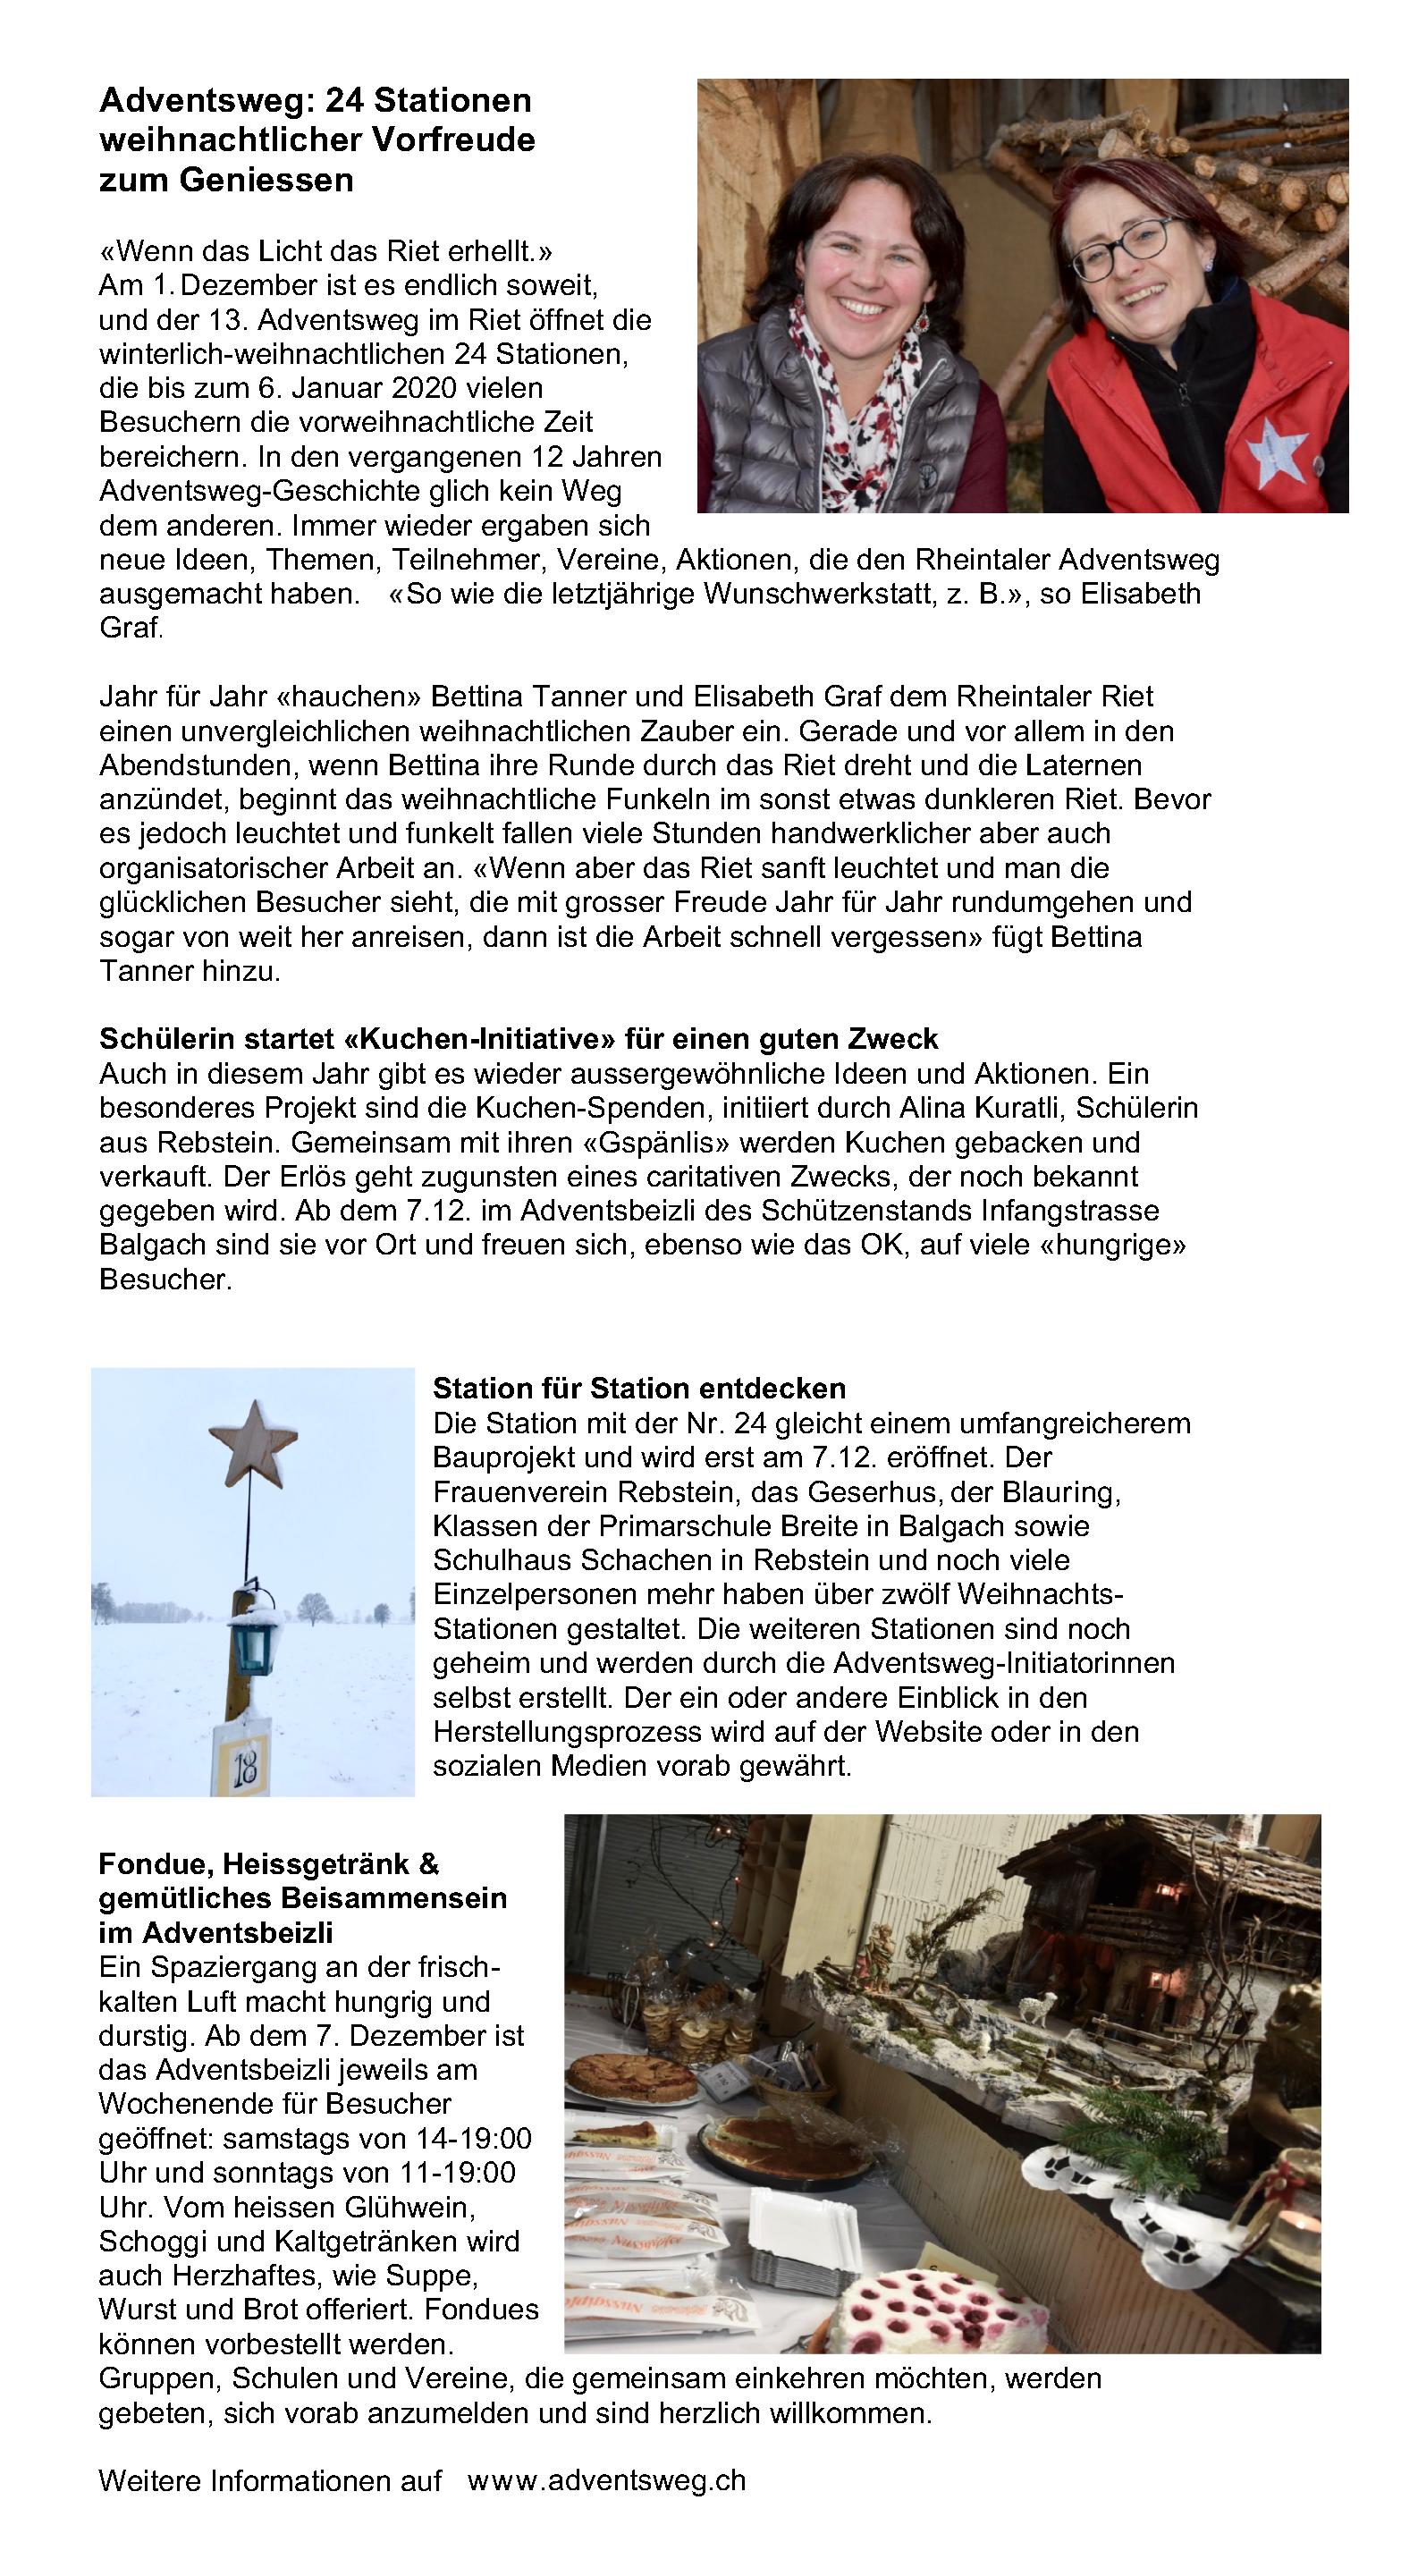 2019-11 Adventsweg13_Vorschaupng